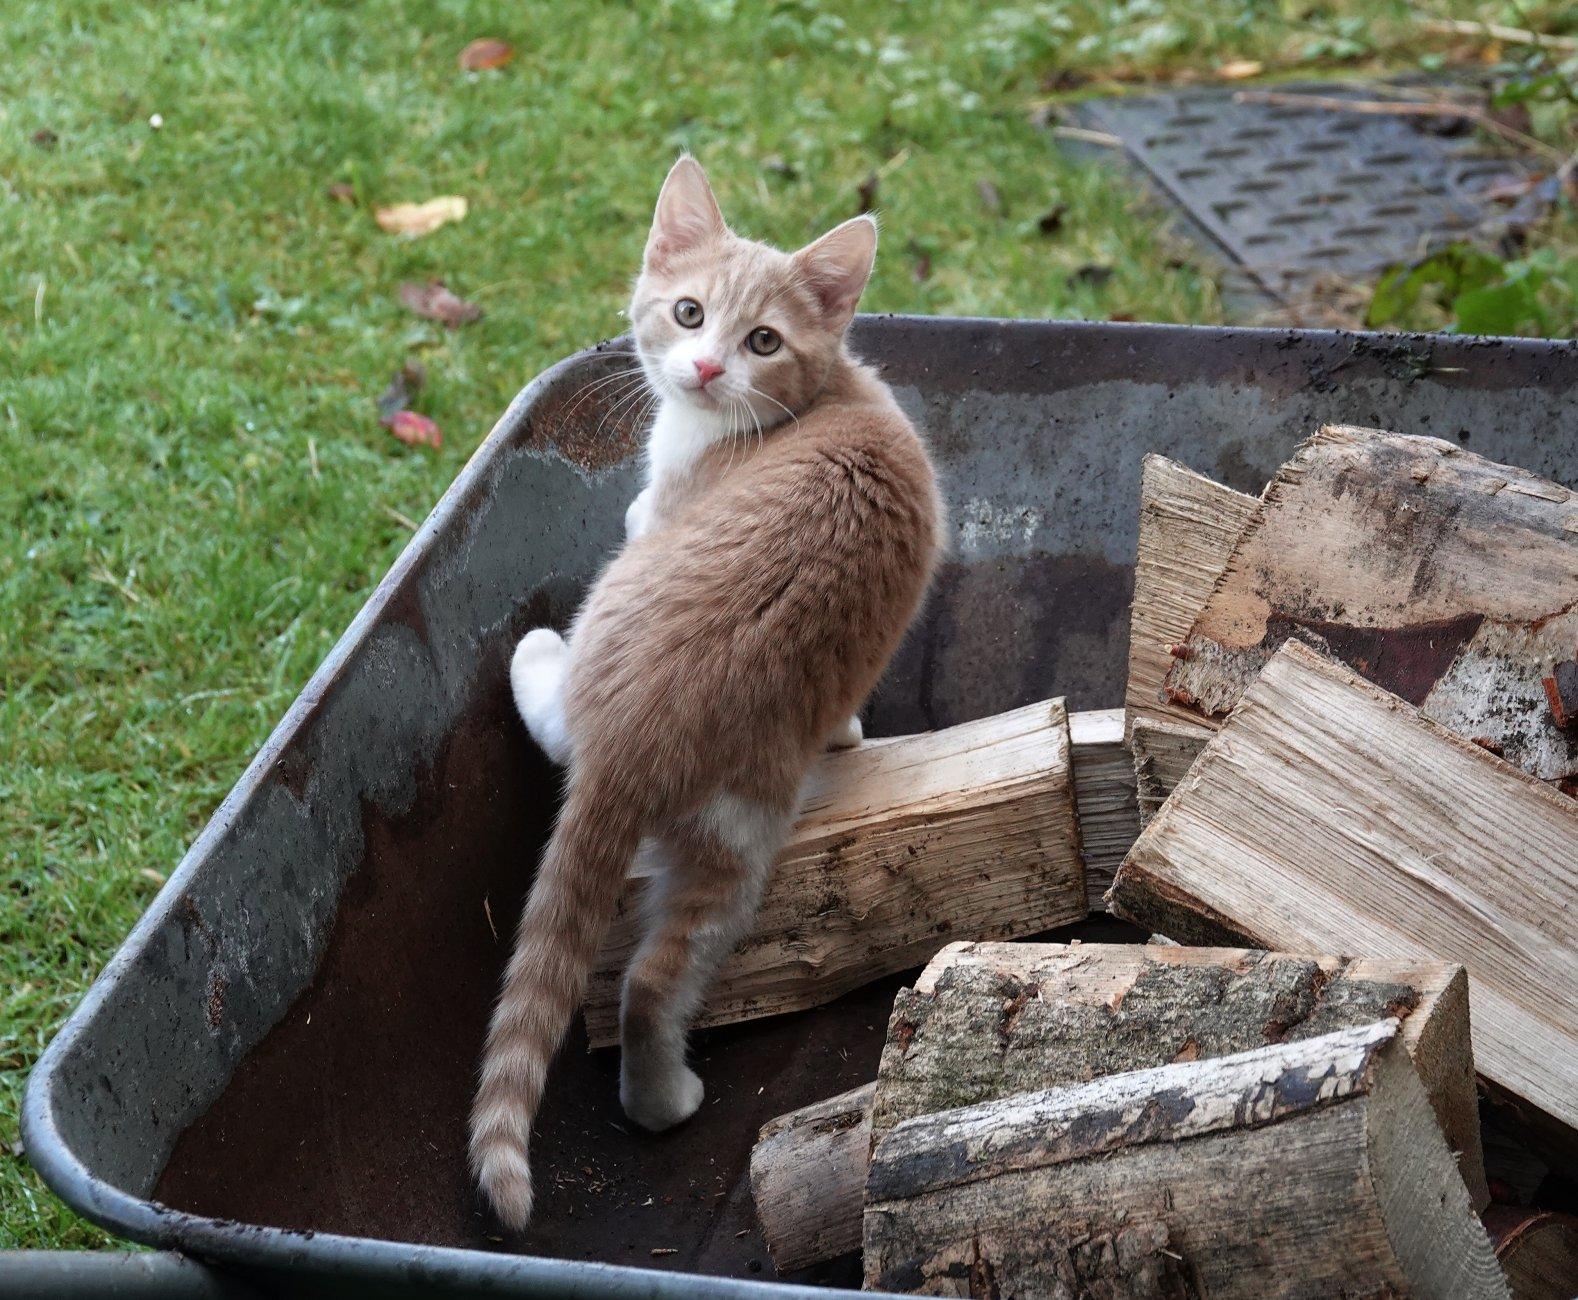 Winston the kitten helping bring firewood in